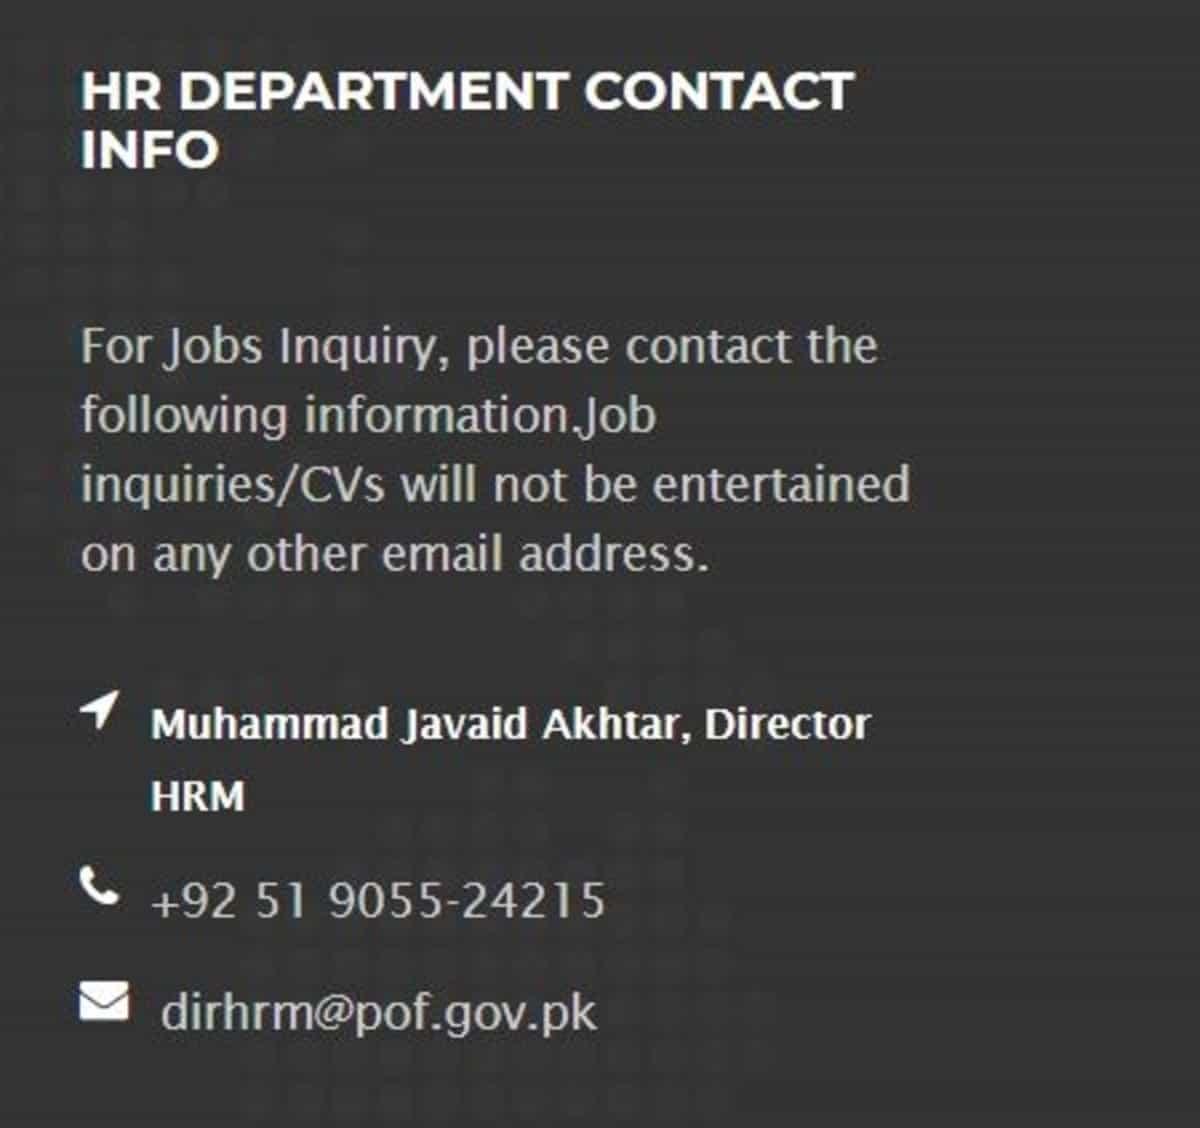 Pakistan Ordnance Factories POF Wah Cantt Jobs 2020 Artisan Training Scheme www.pof.gov.pk Apply Online 2